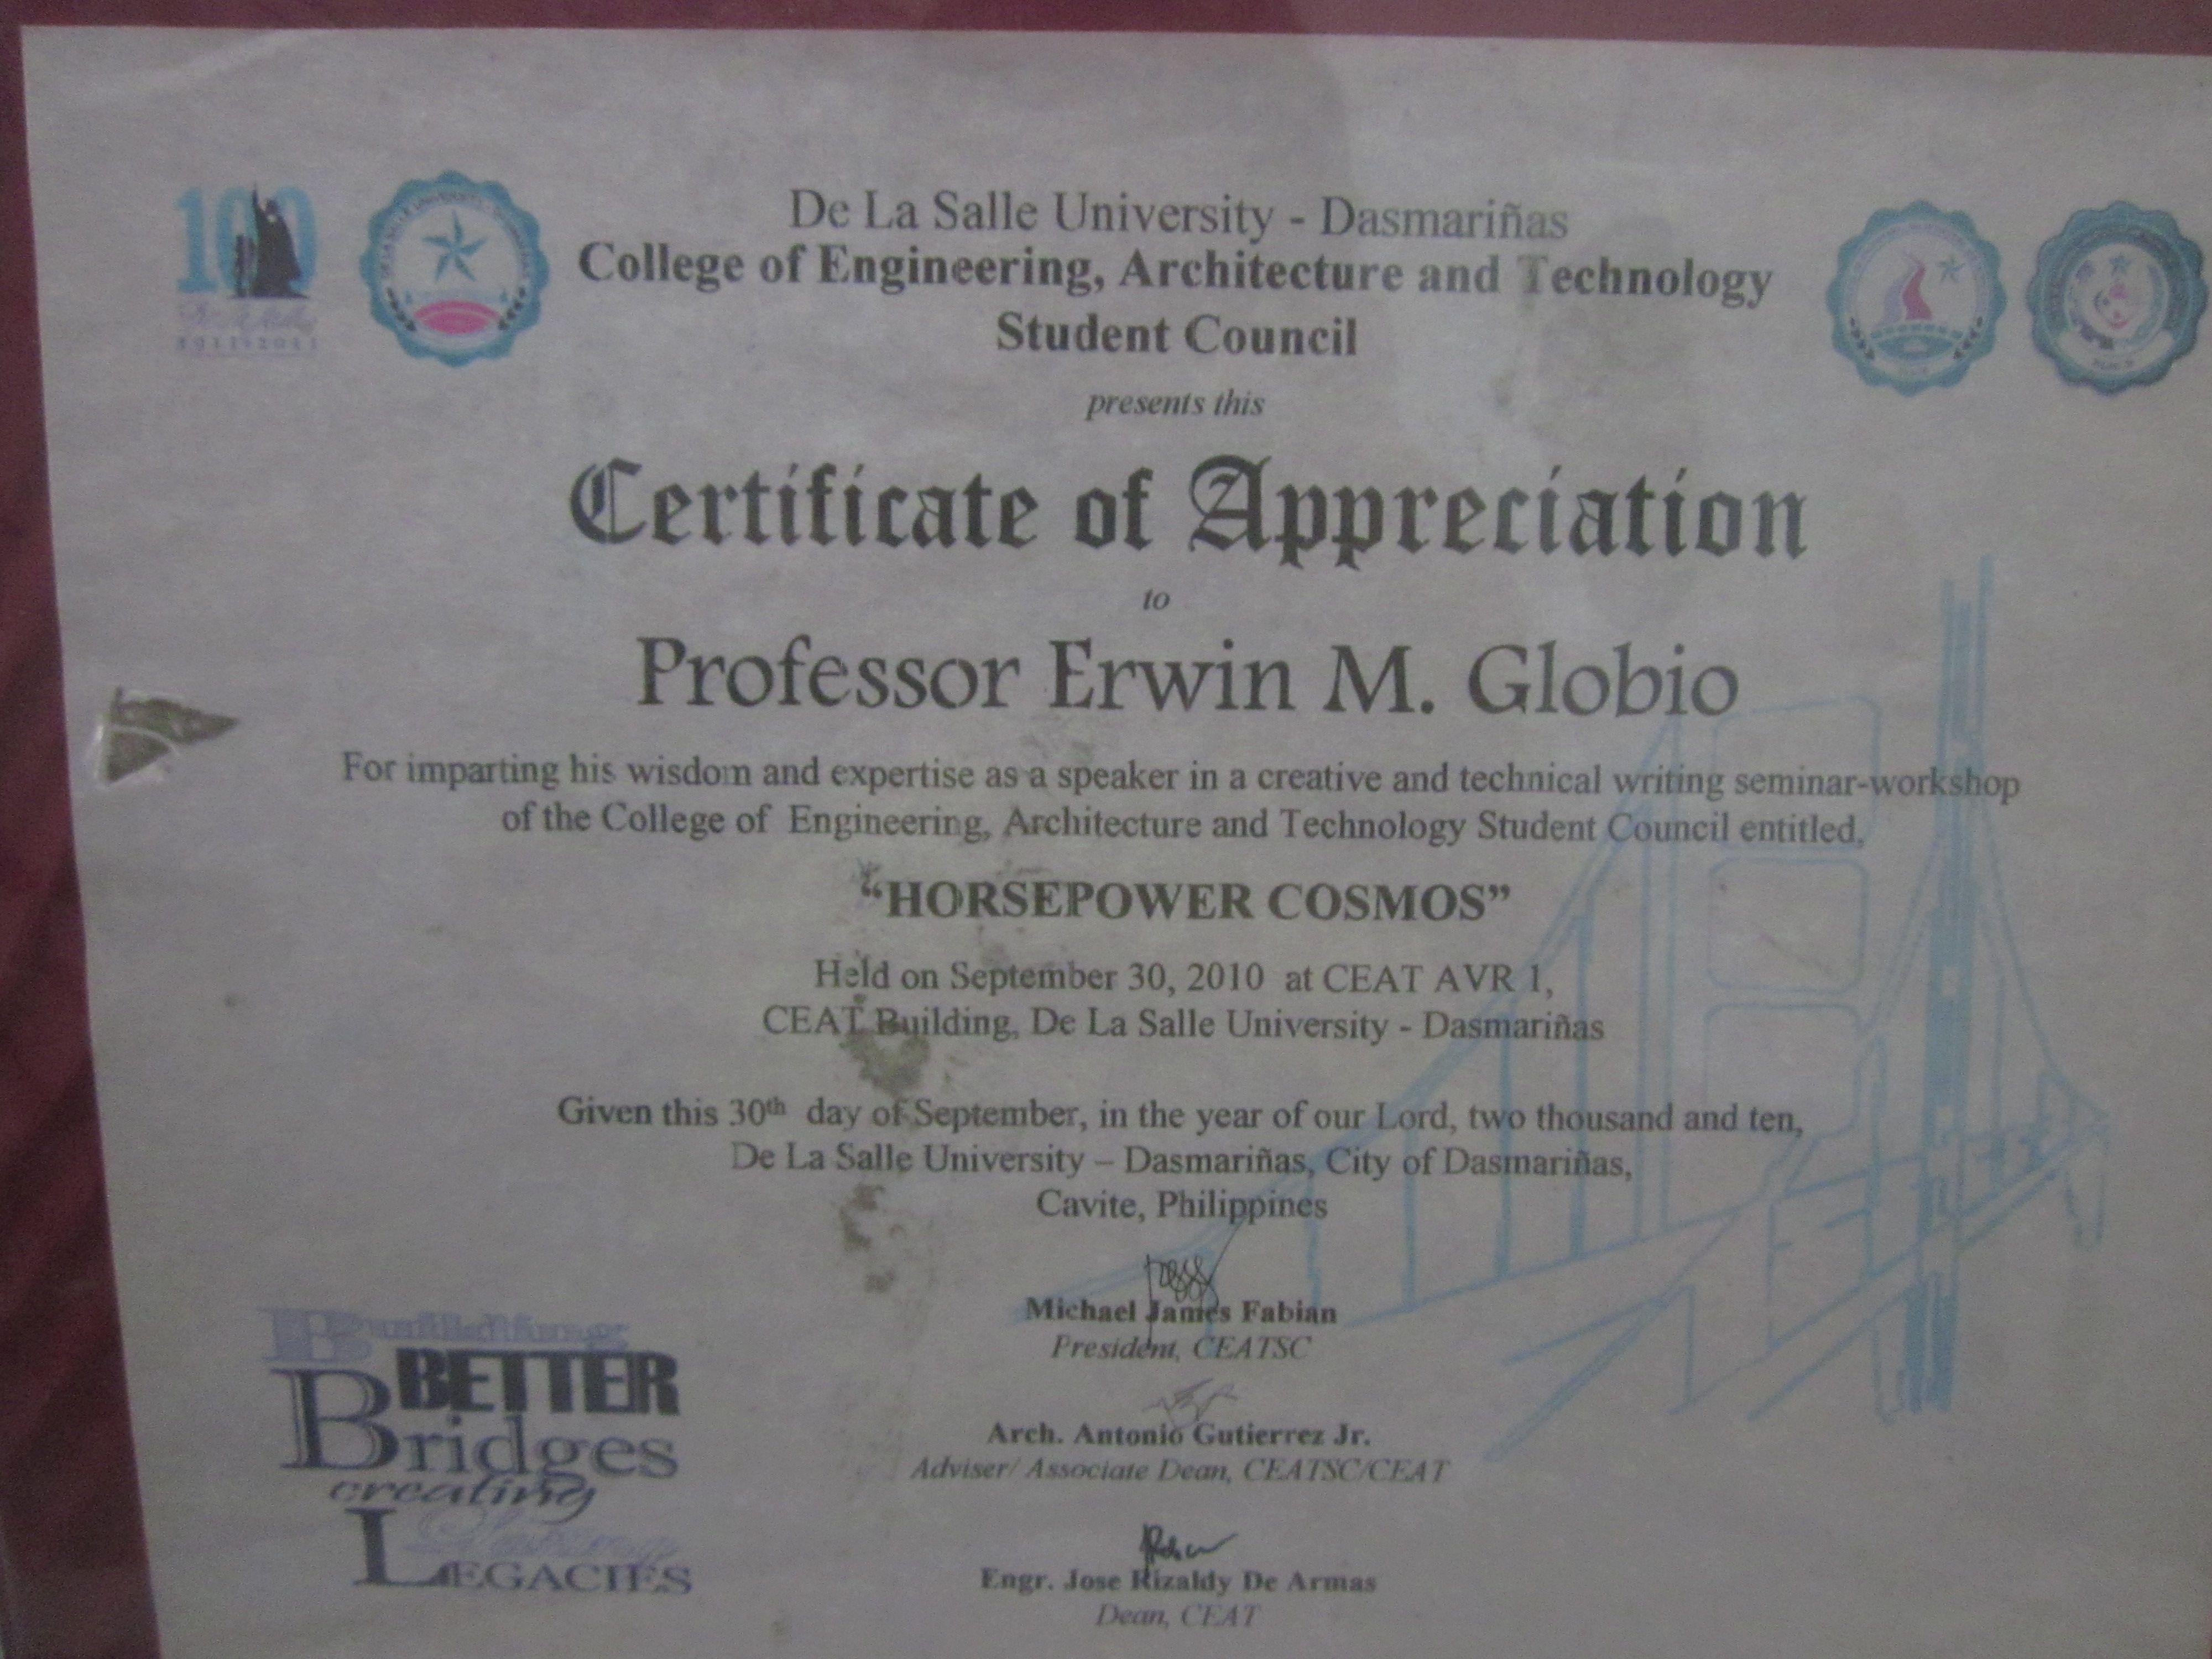 Prof erwin globios certificate of appreciation resource erwin globios certificate of appreciation resource speakers certificate pinterest certificate yelopaper Gallery